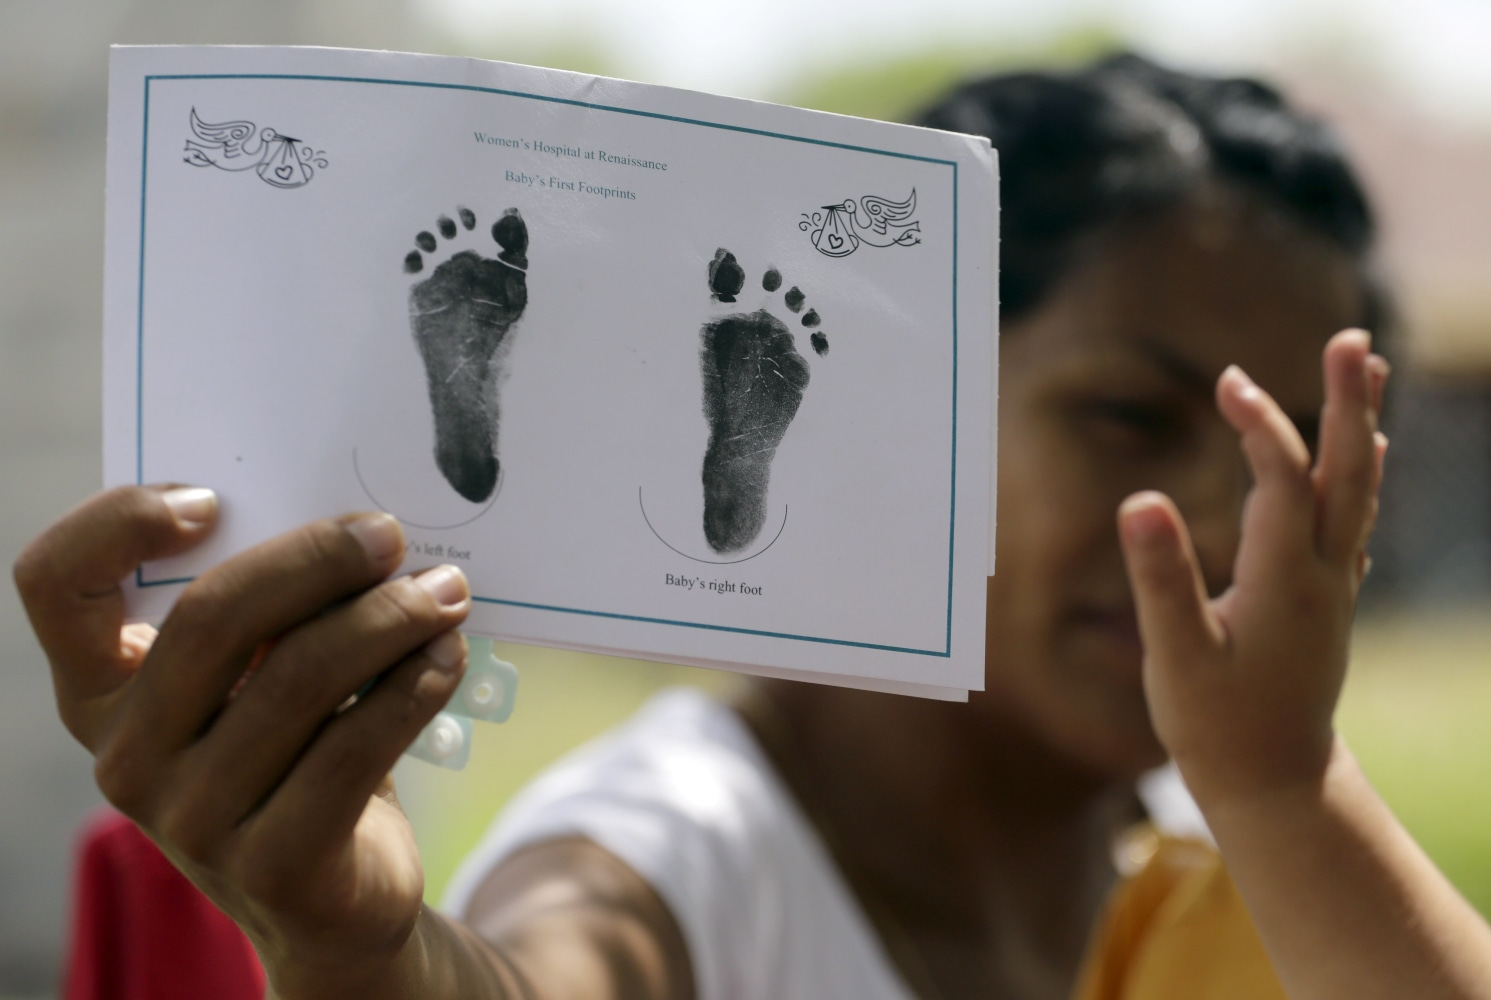 Texas Birth Certificate Rules Often Unenforced